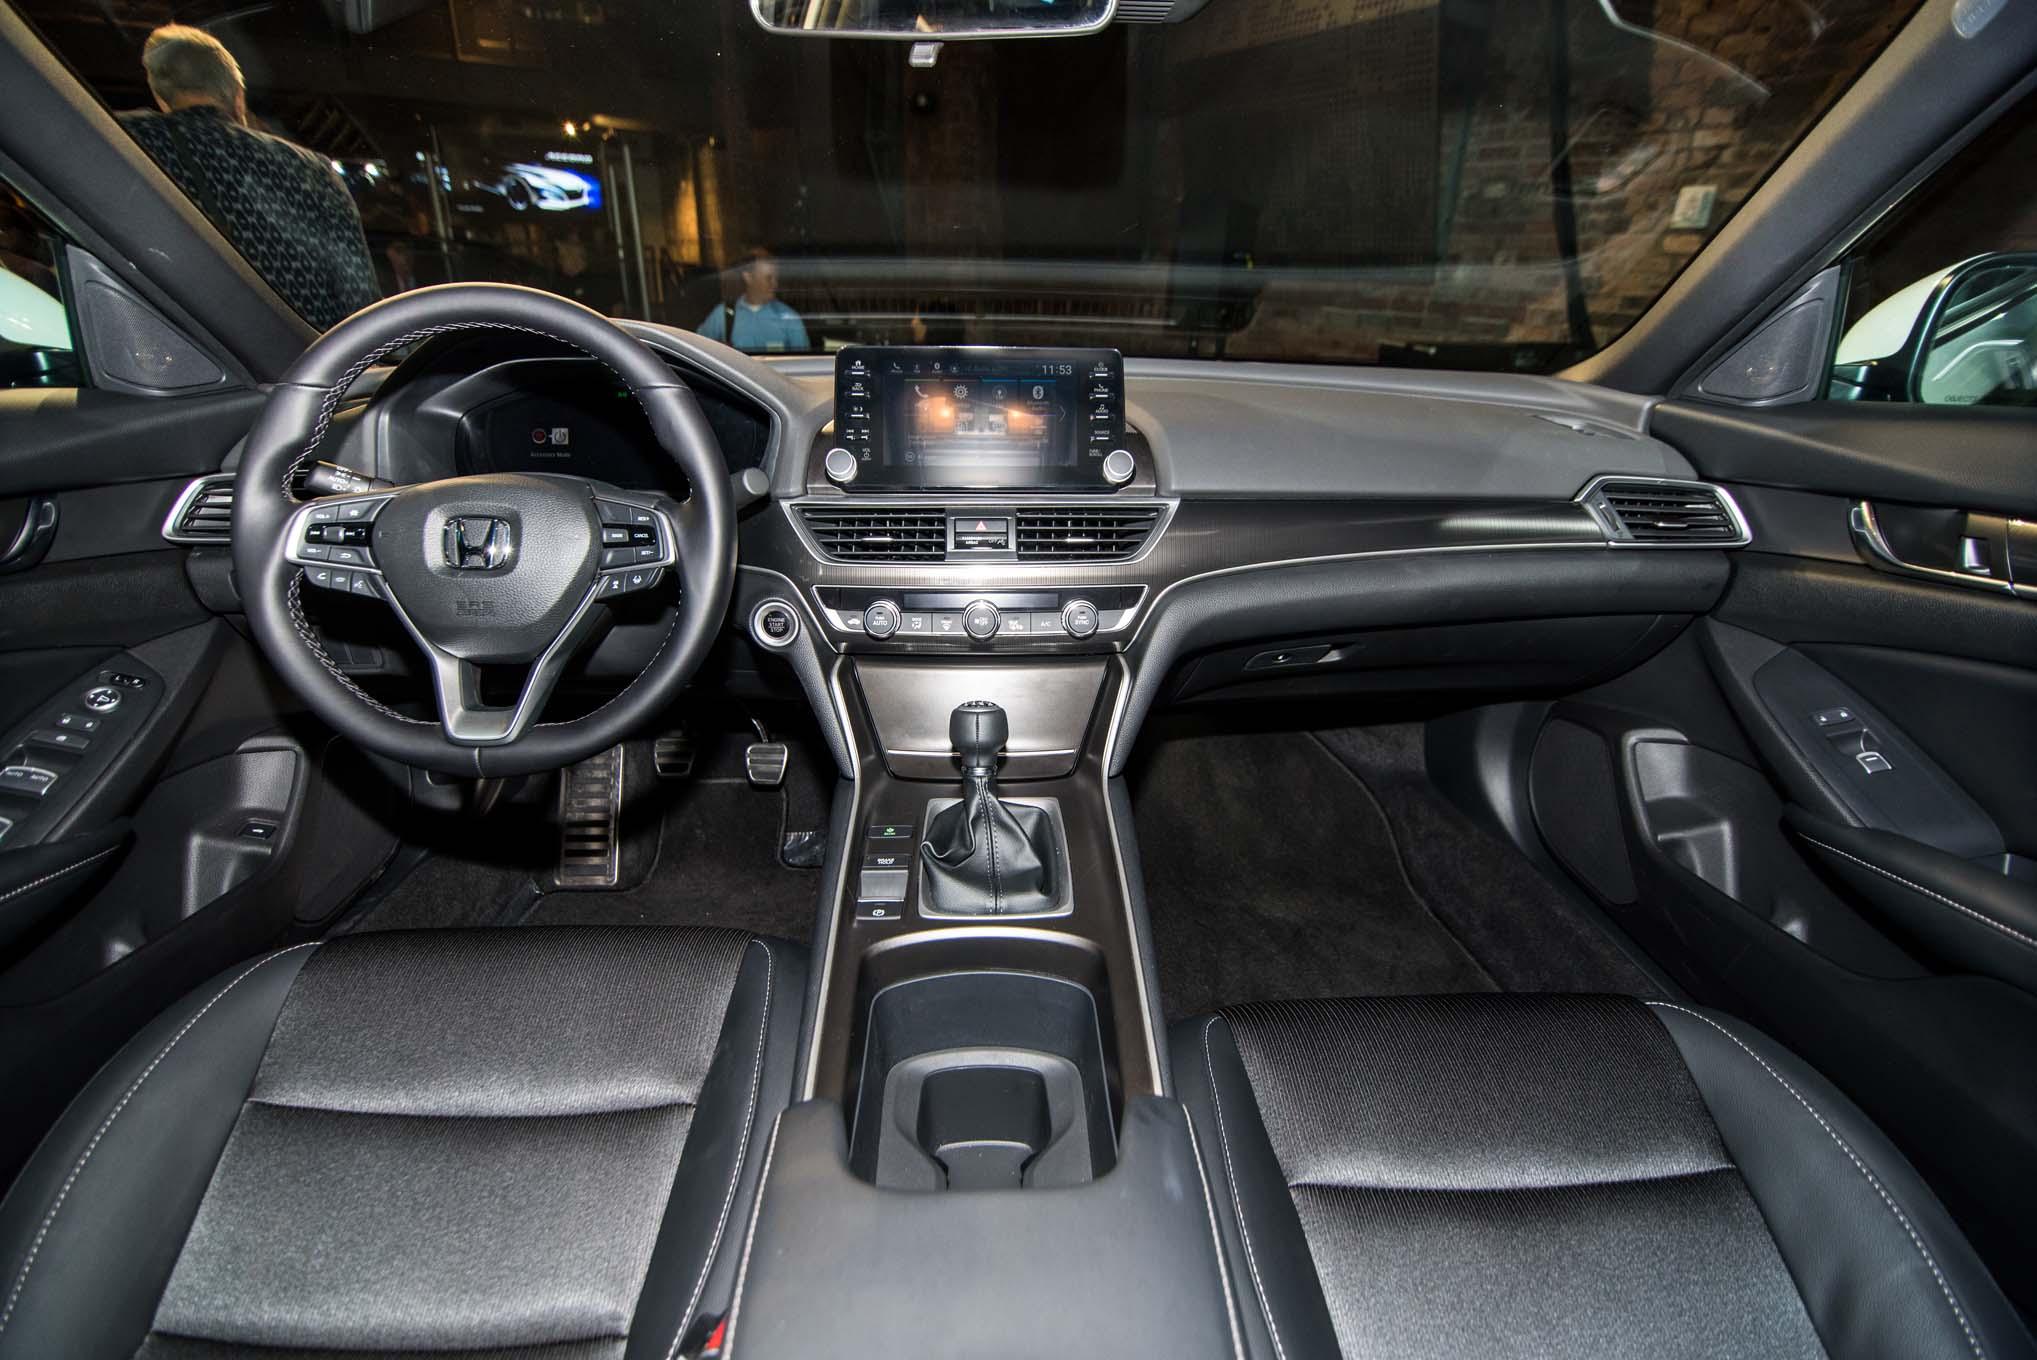 Honda Accord 2018 Primer Vistazo Motor Trend En Espa Ol